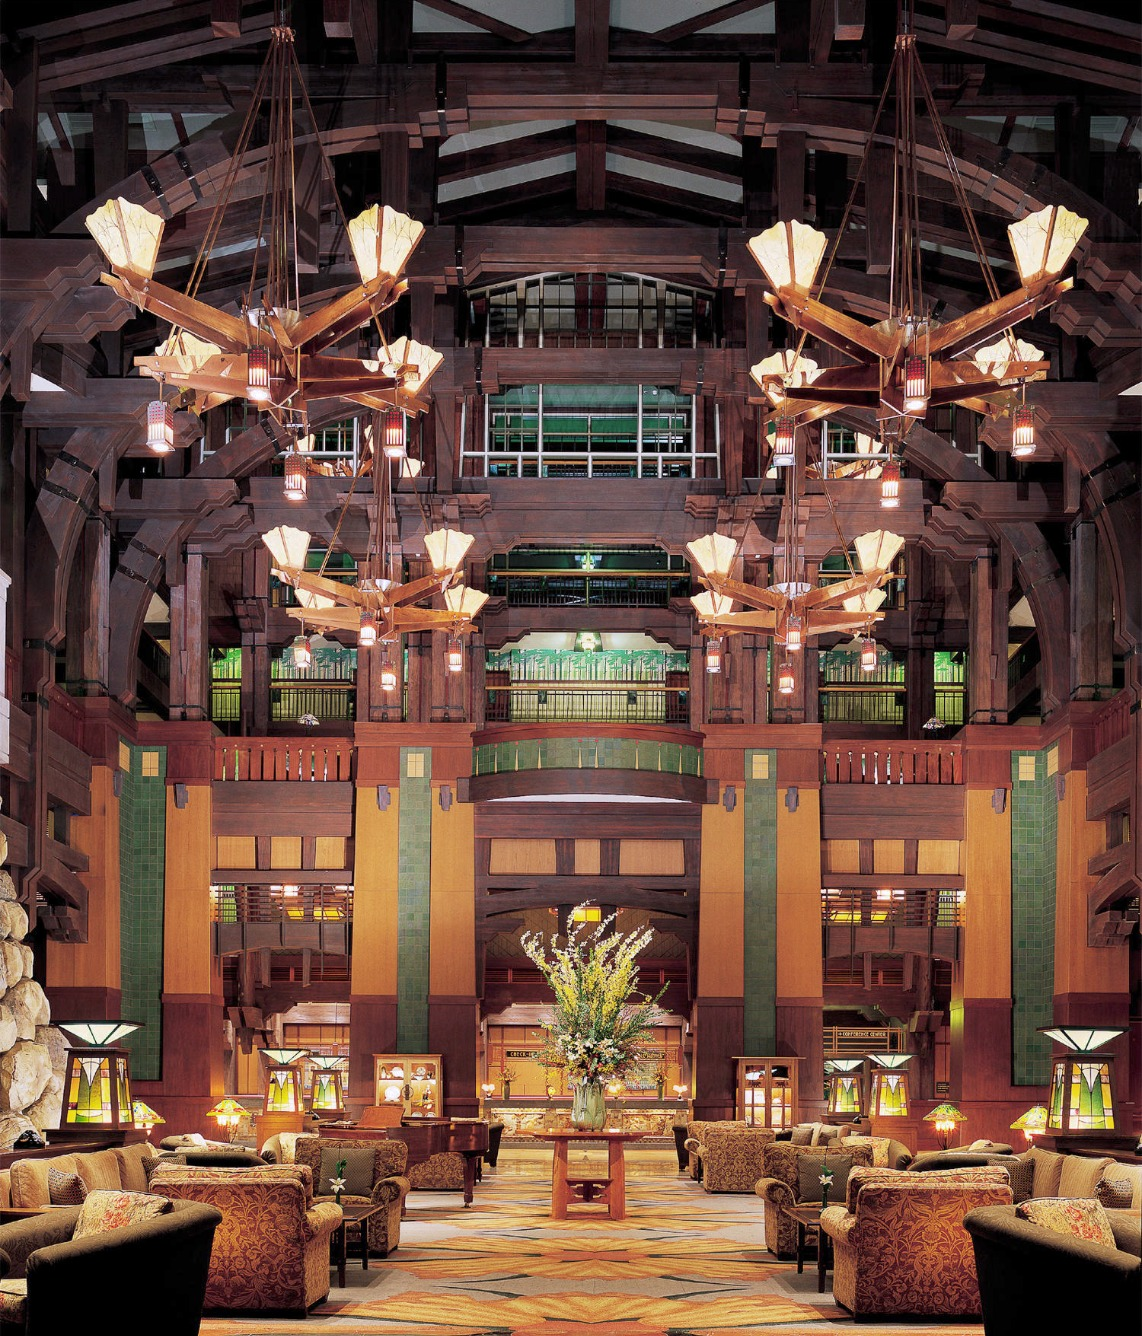 Hotel Located in Anaheim